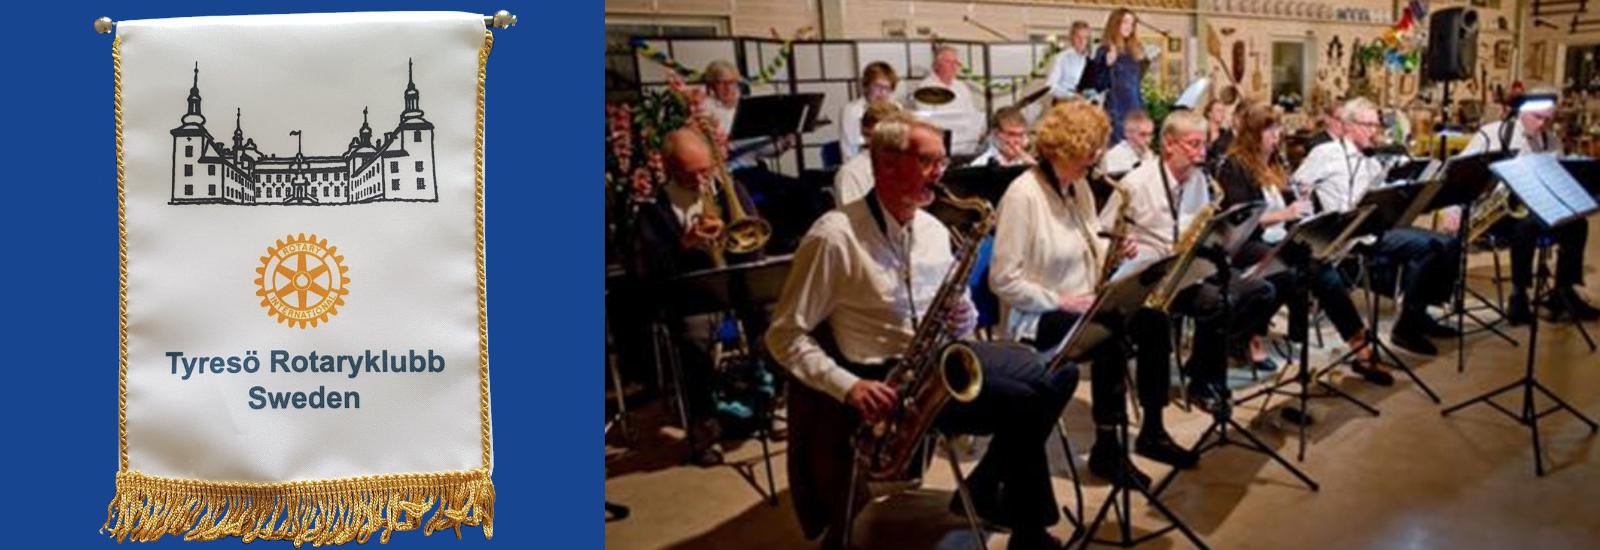 Tyresö-hemsida-flagga--orkester.png